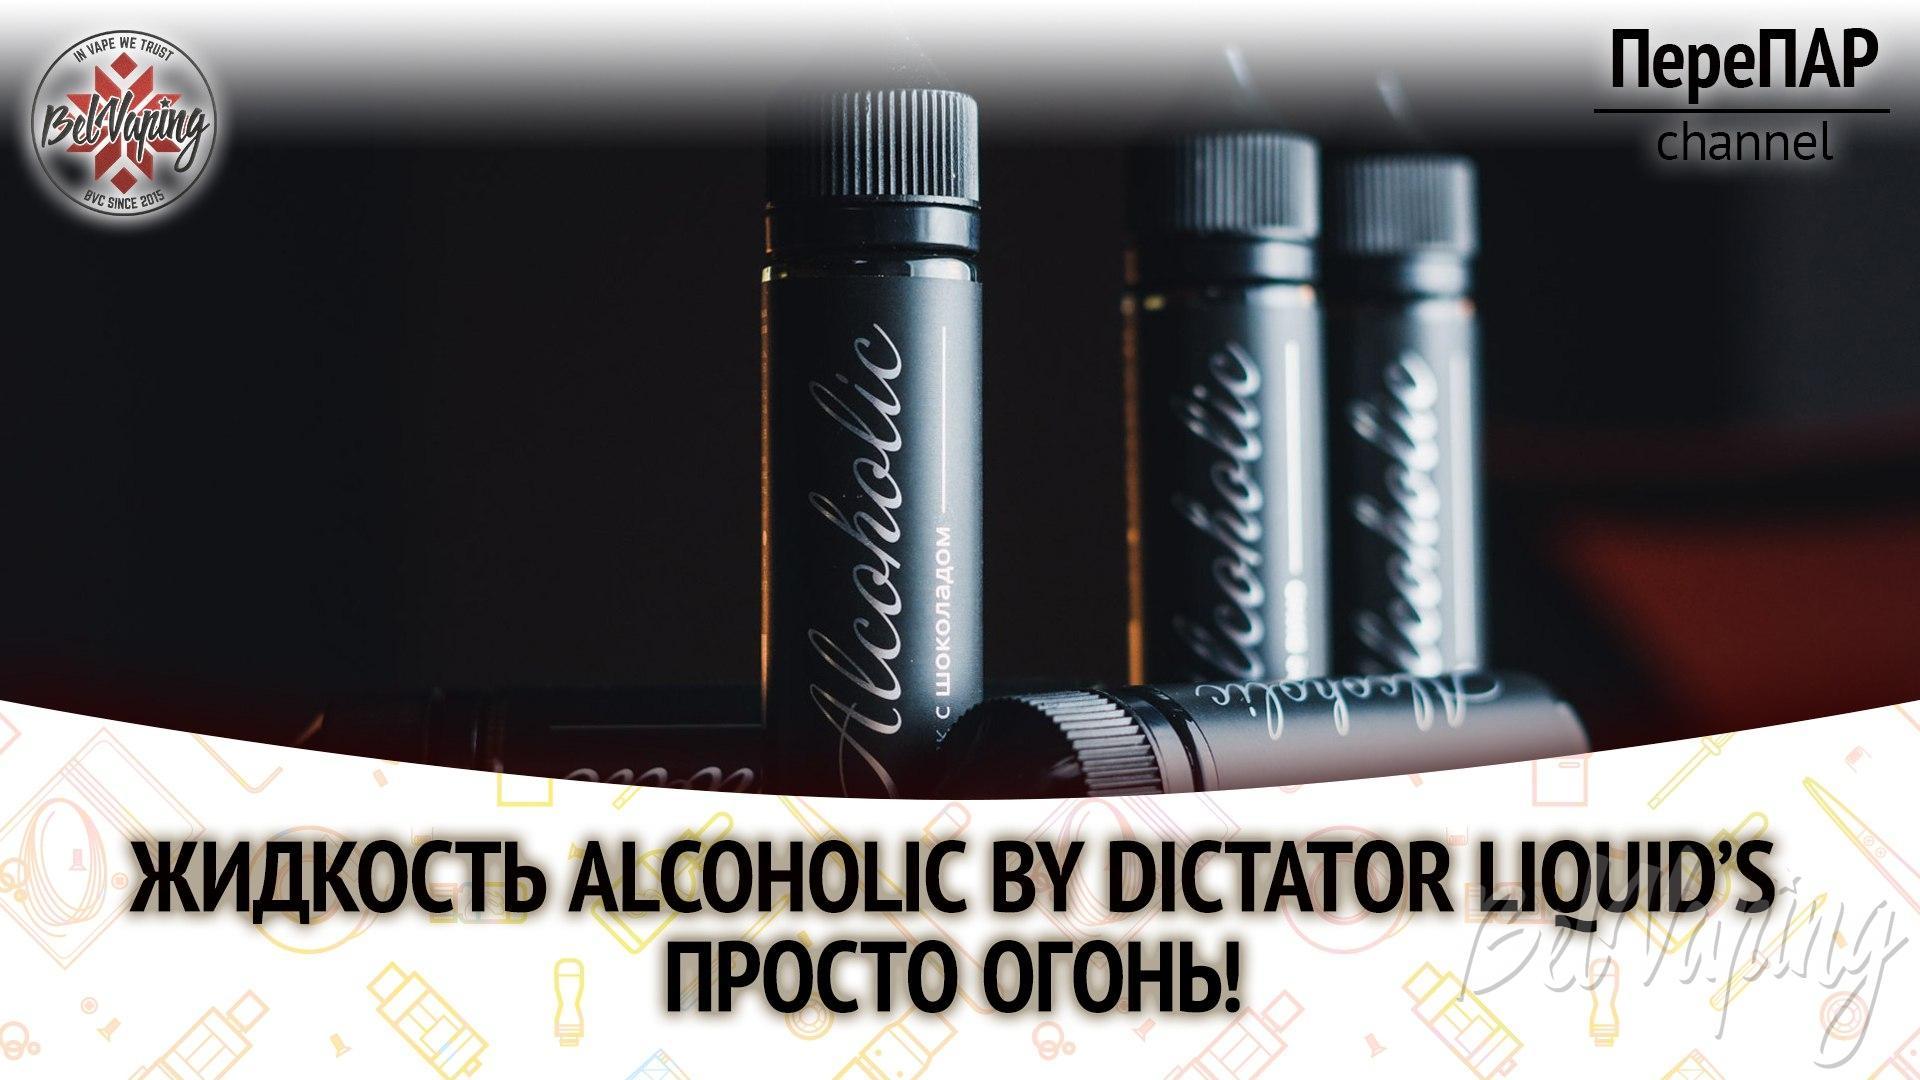 Обзор жидкости Alcoholic